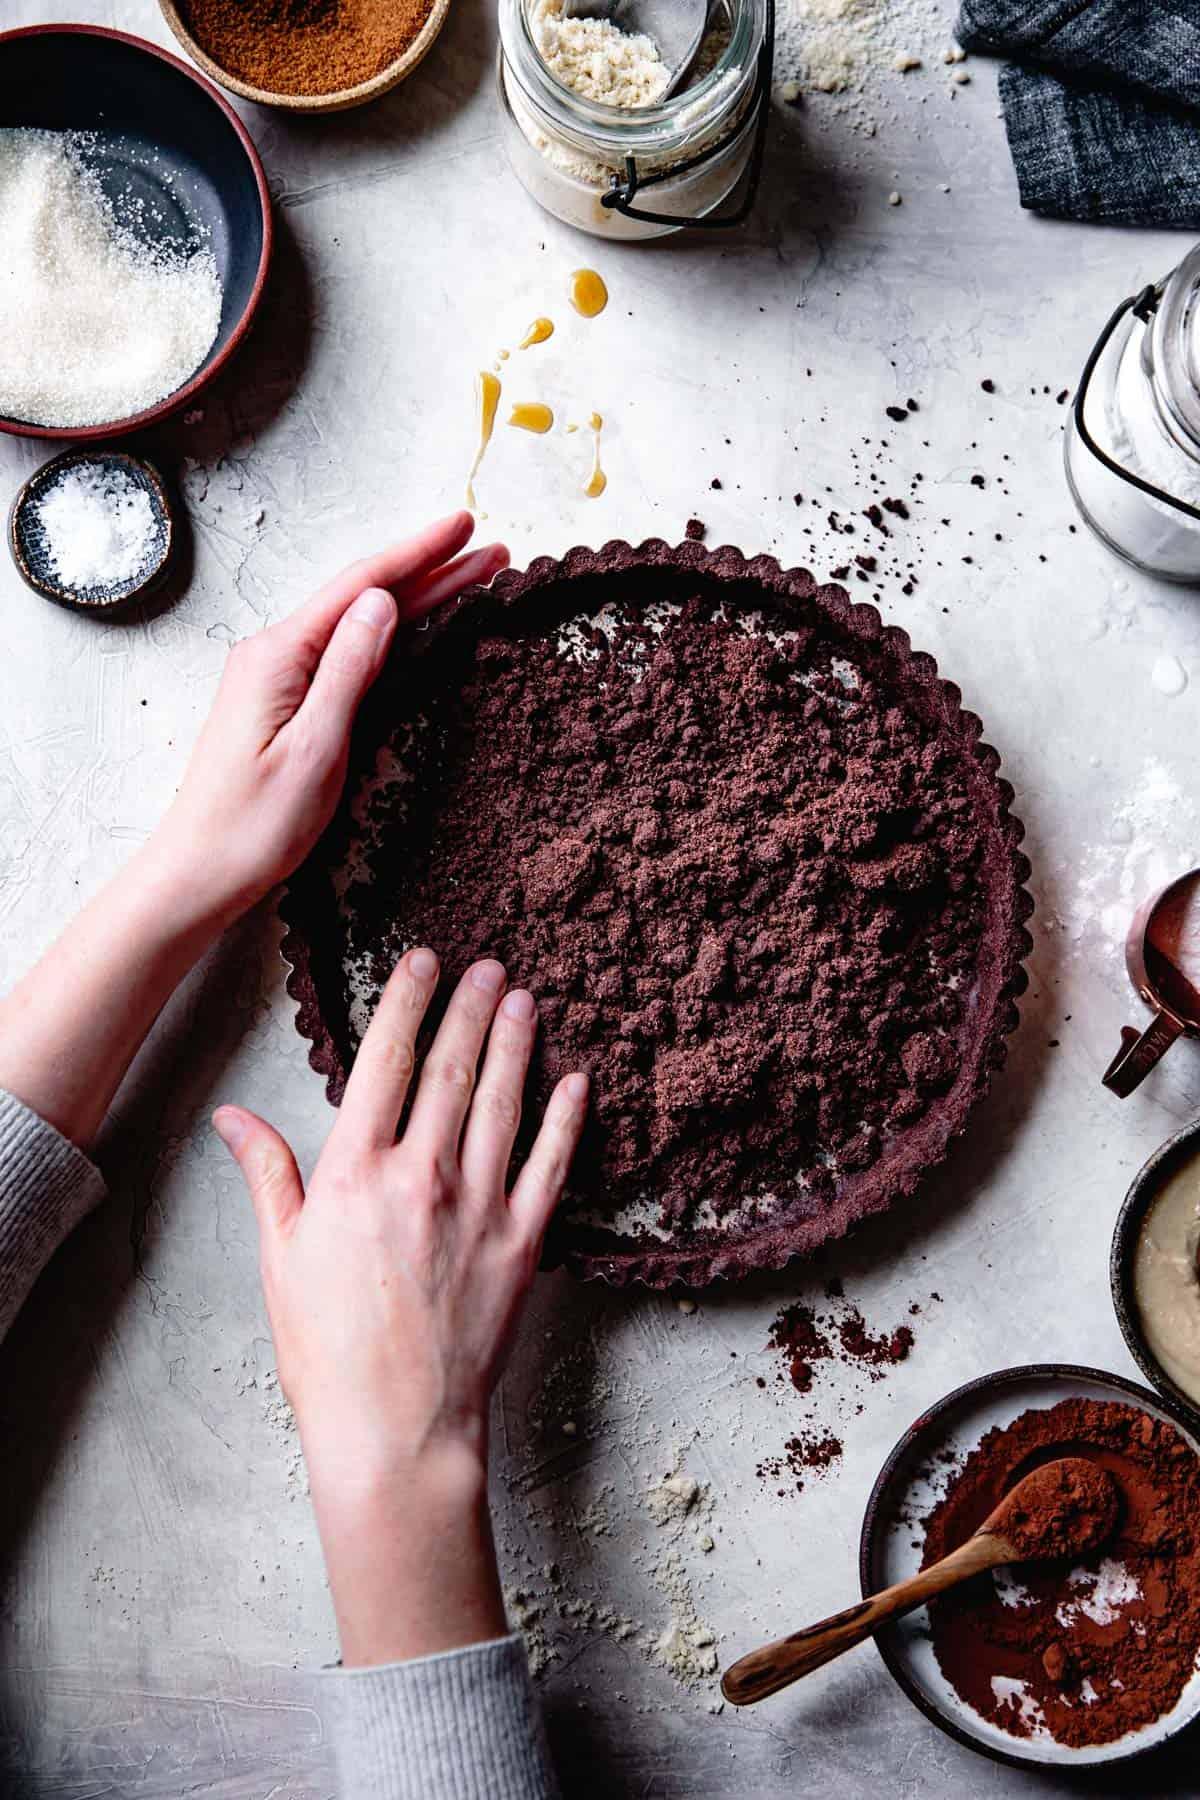 pressing down Gluten Free Vegan Almond Flour Tart Crust